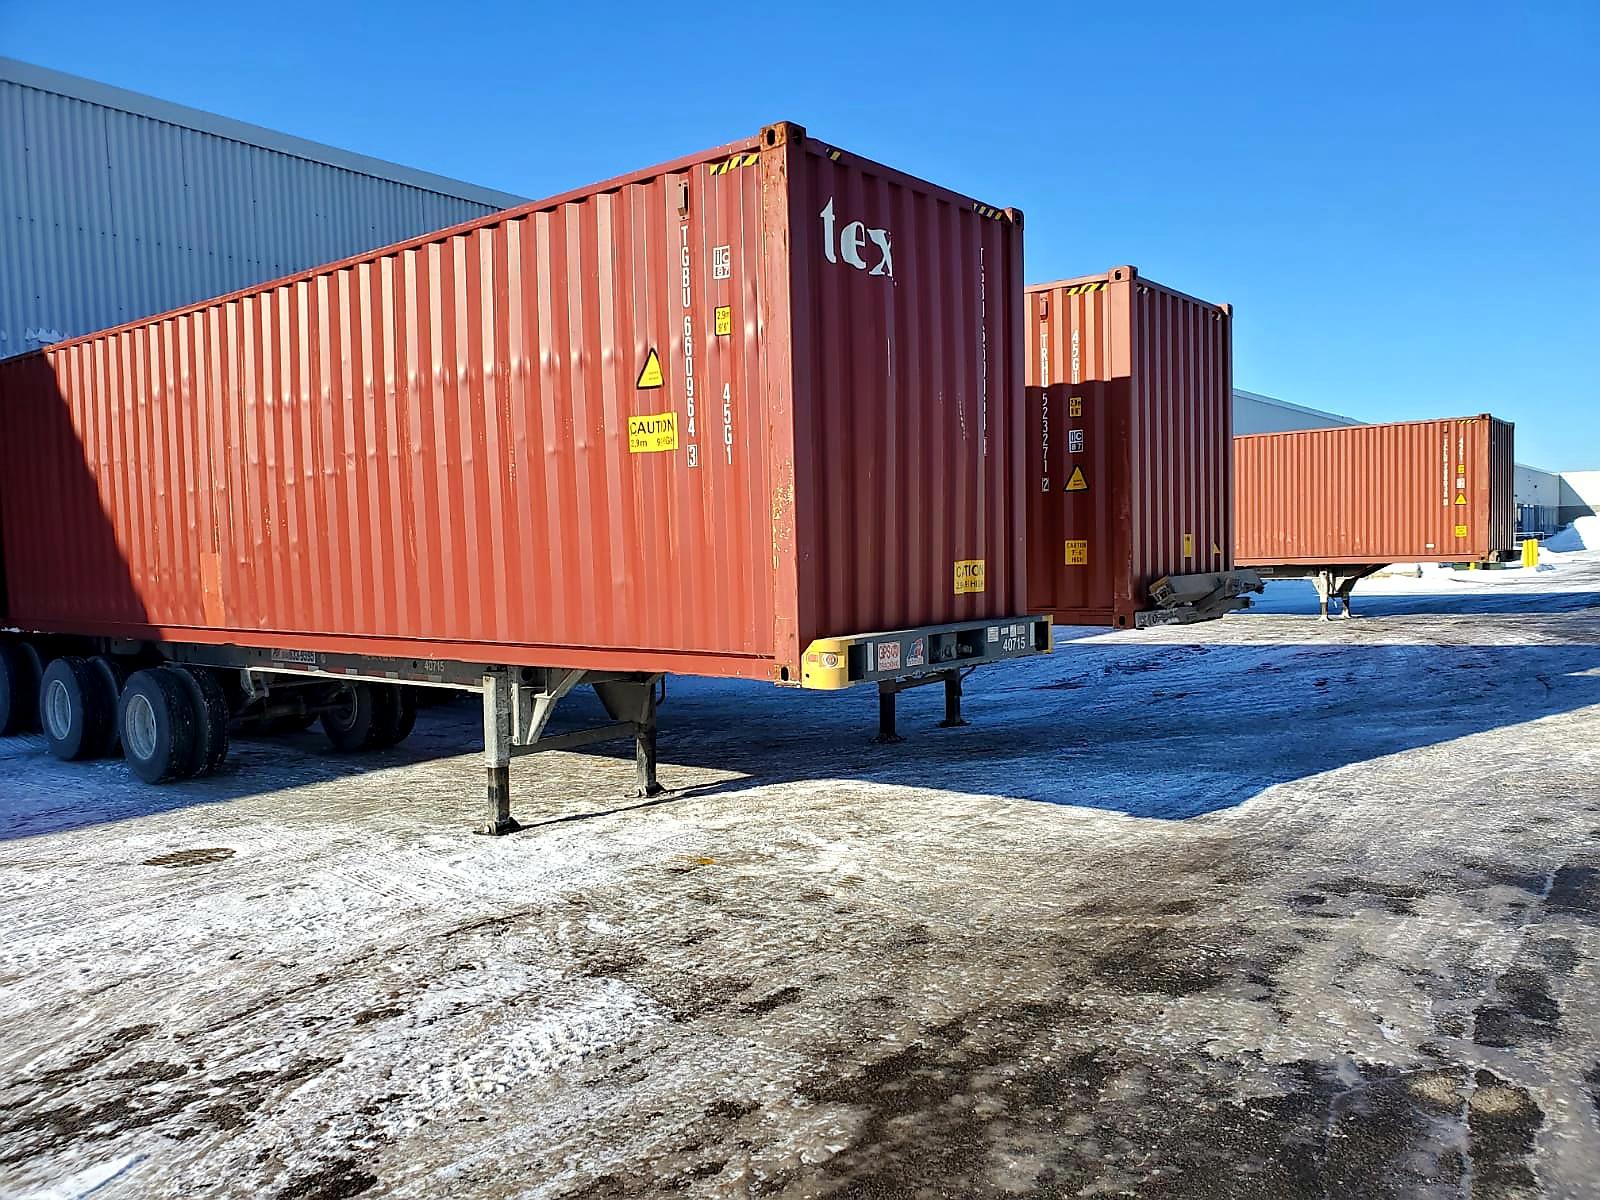 warehouse distribution image